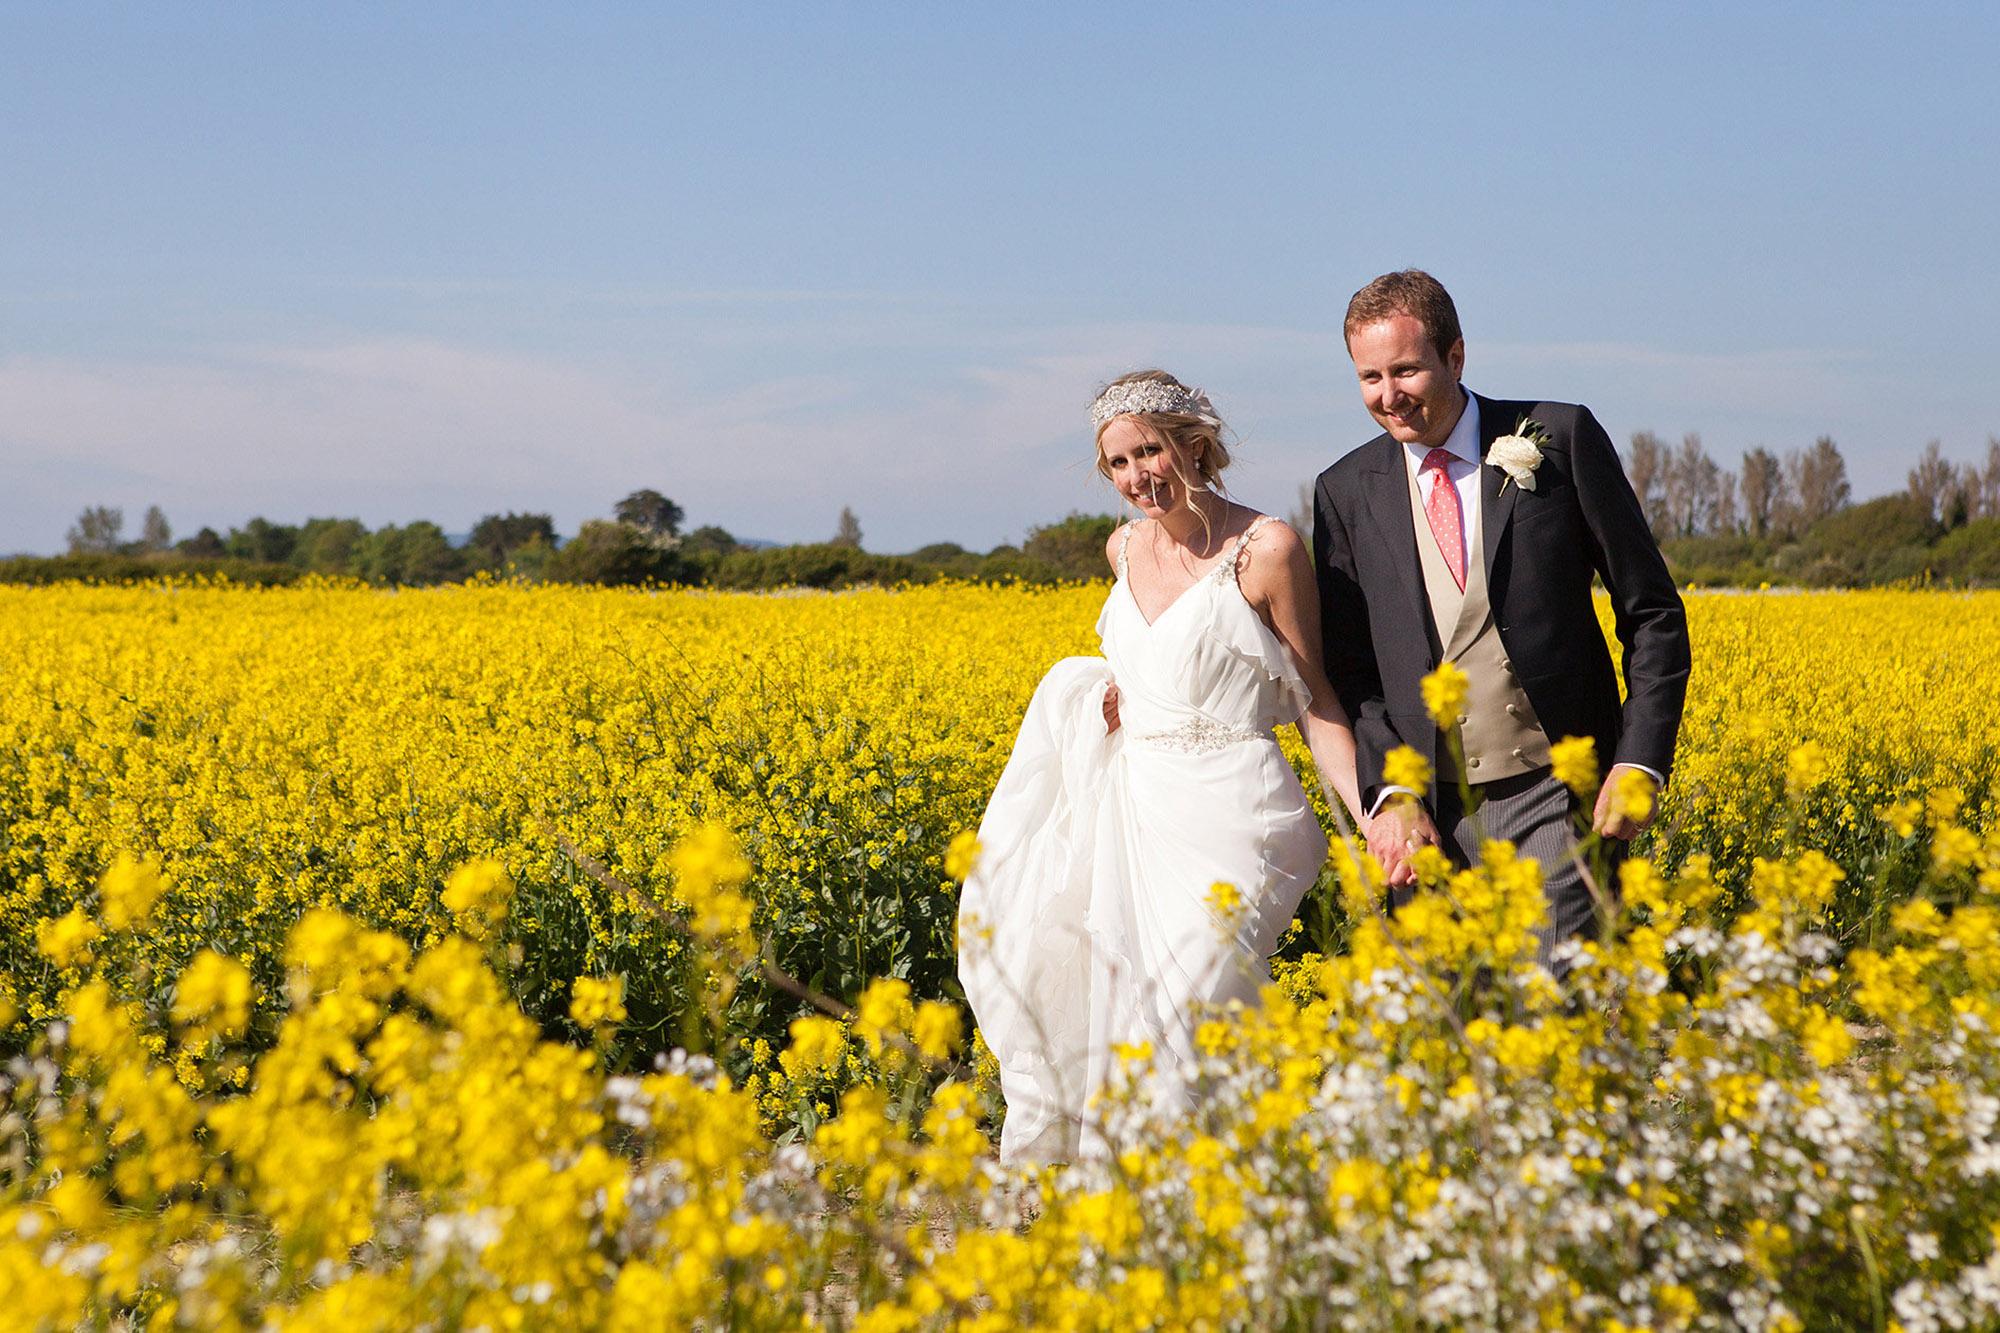 julia-toms-featured-weddings-west-sussex-006.jpg